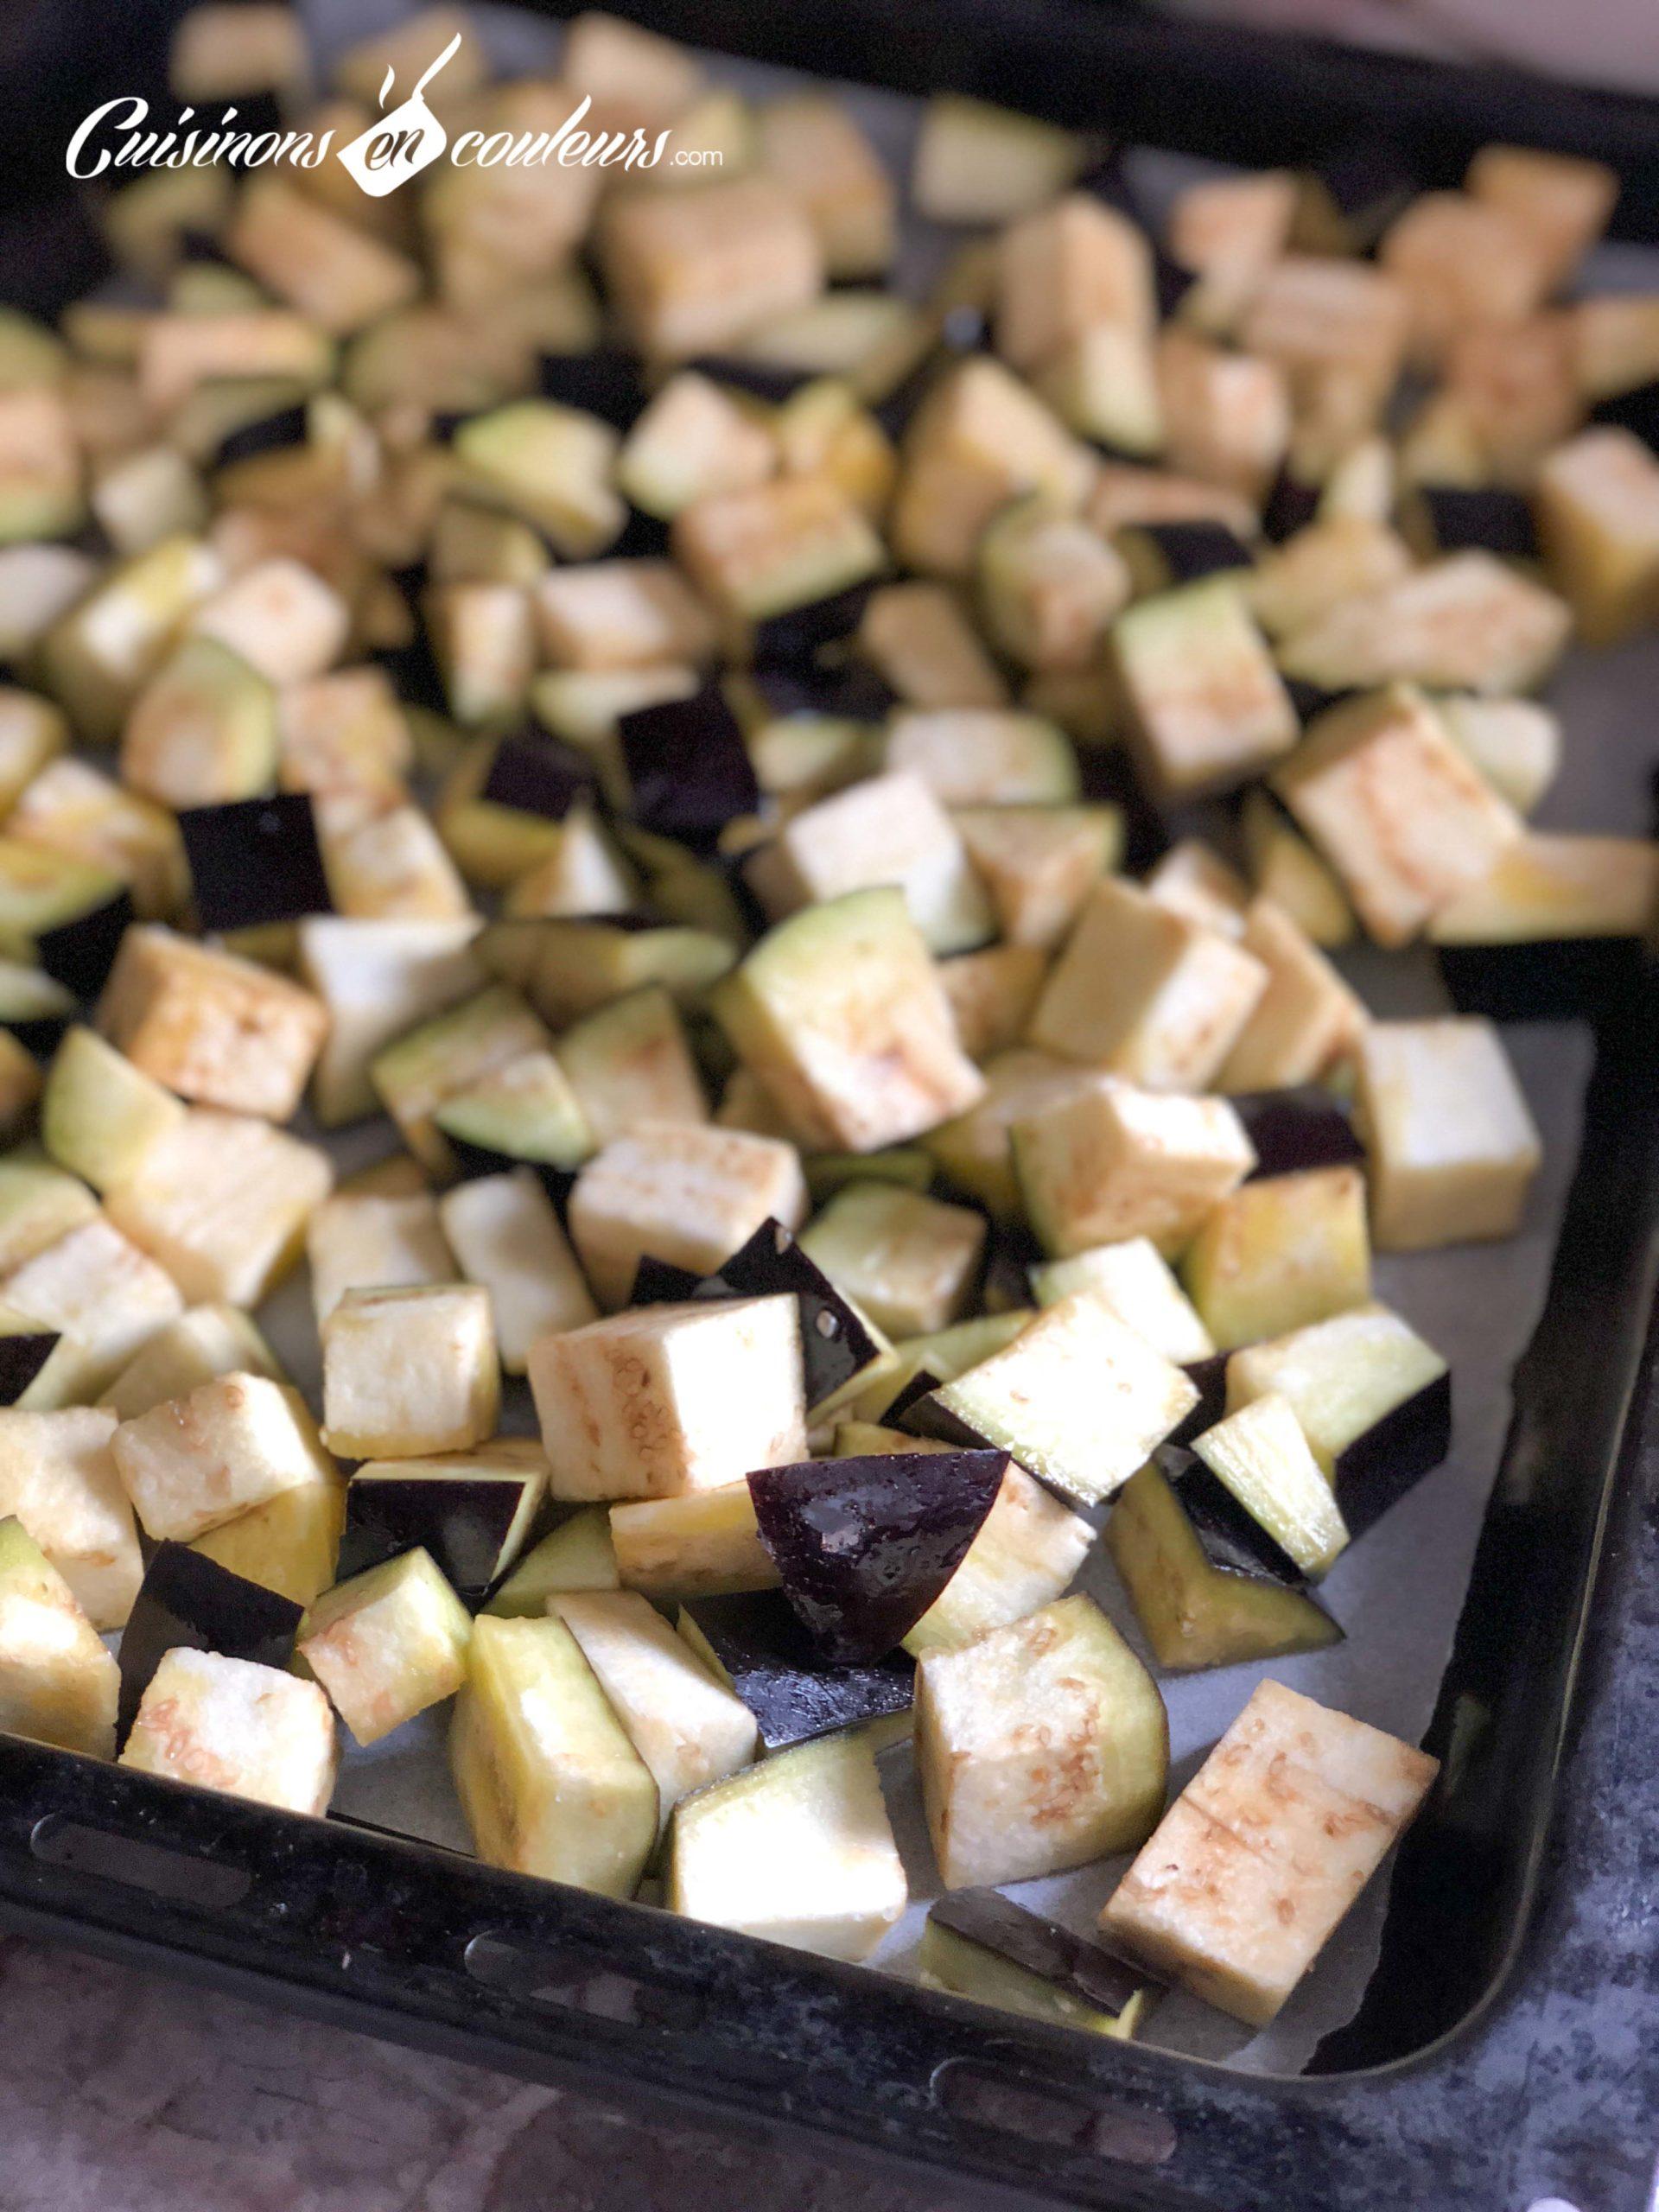 tajine-aubergines-10-scaled - Tajine de boeuf aux aubergines